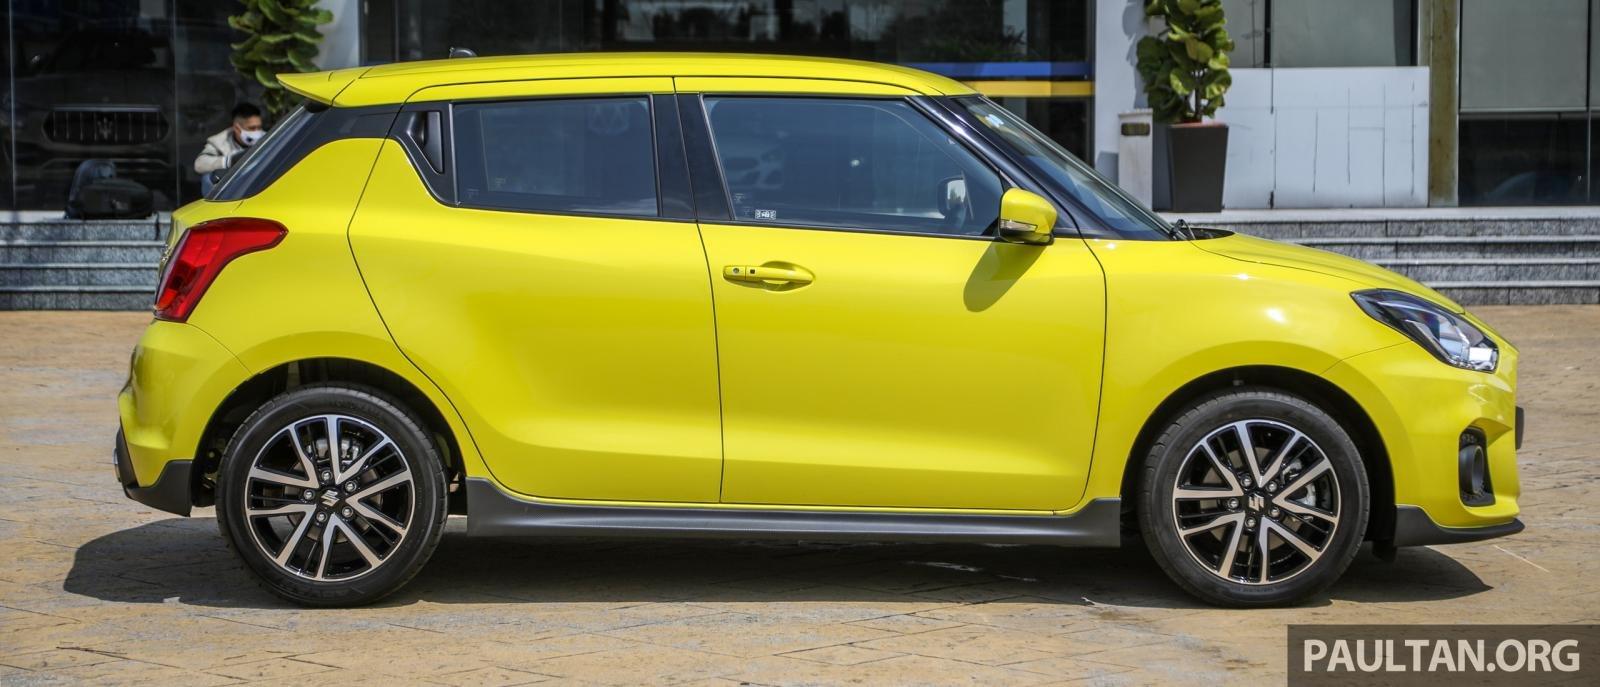 Suzuki Swift Sport 2021 cập nhật mới được cải tiến sức mạnh.